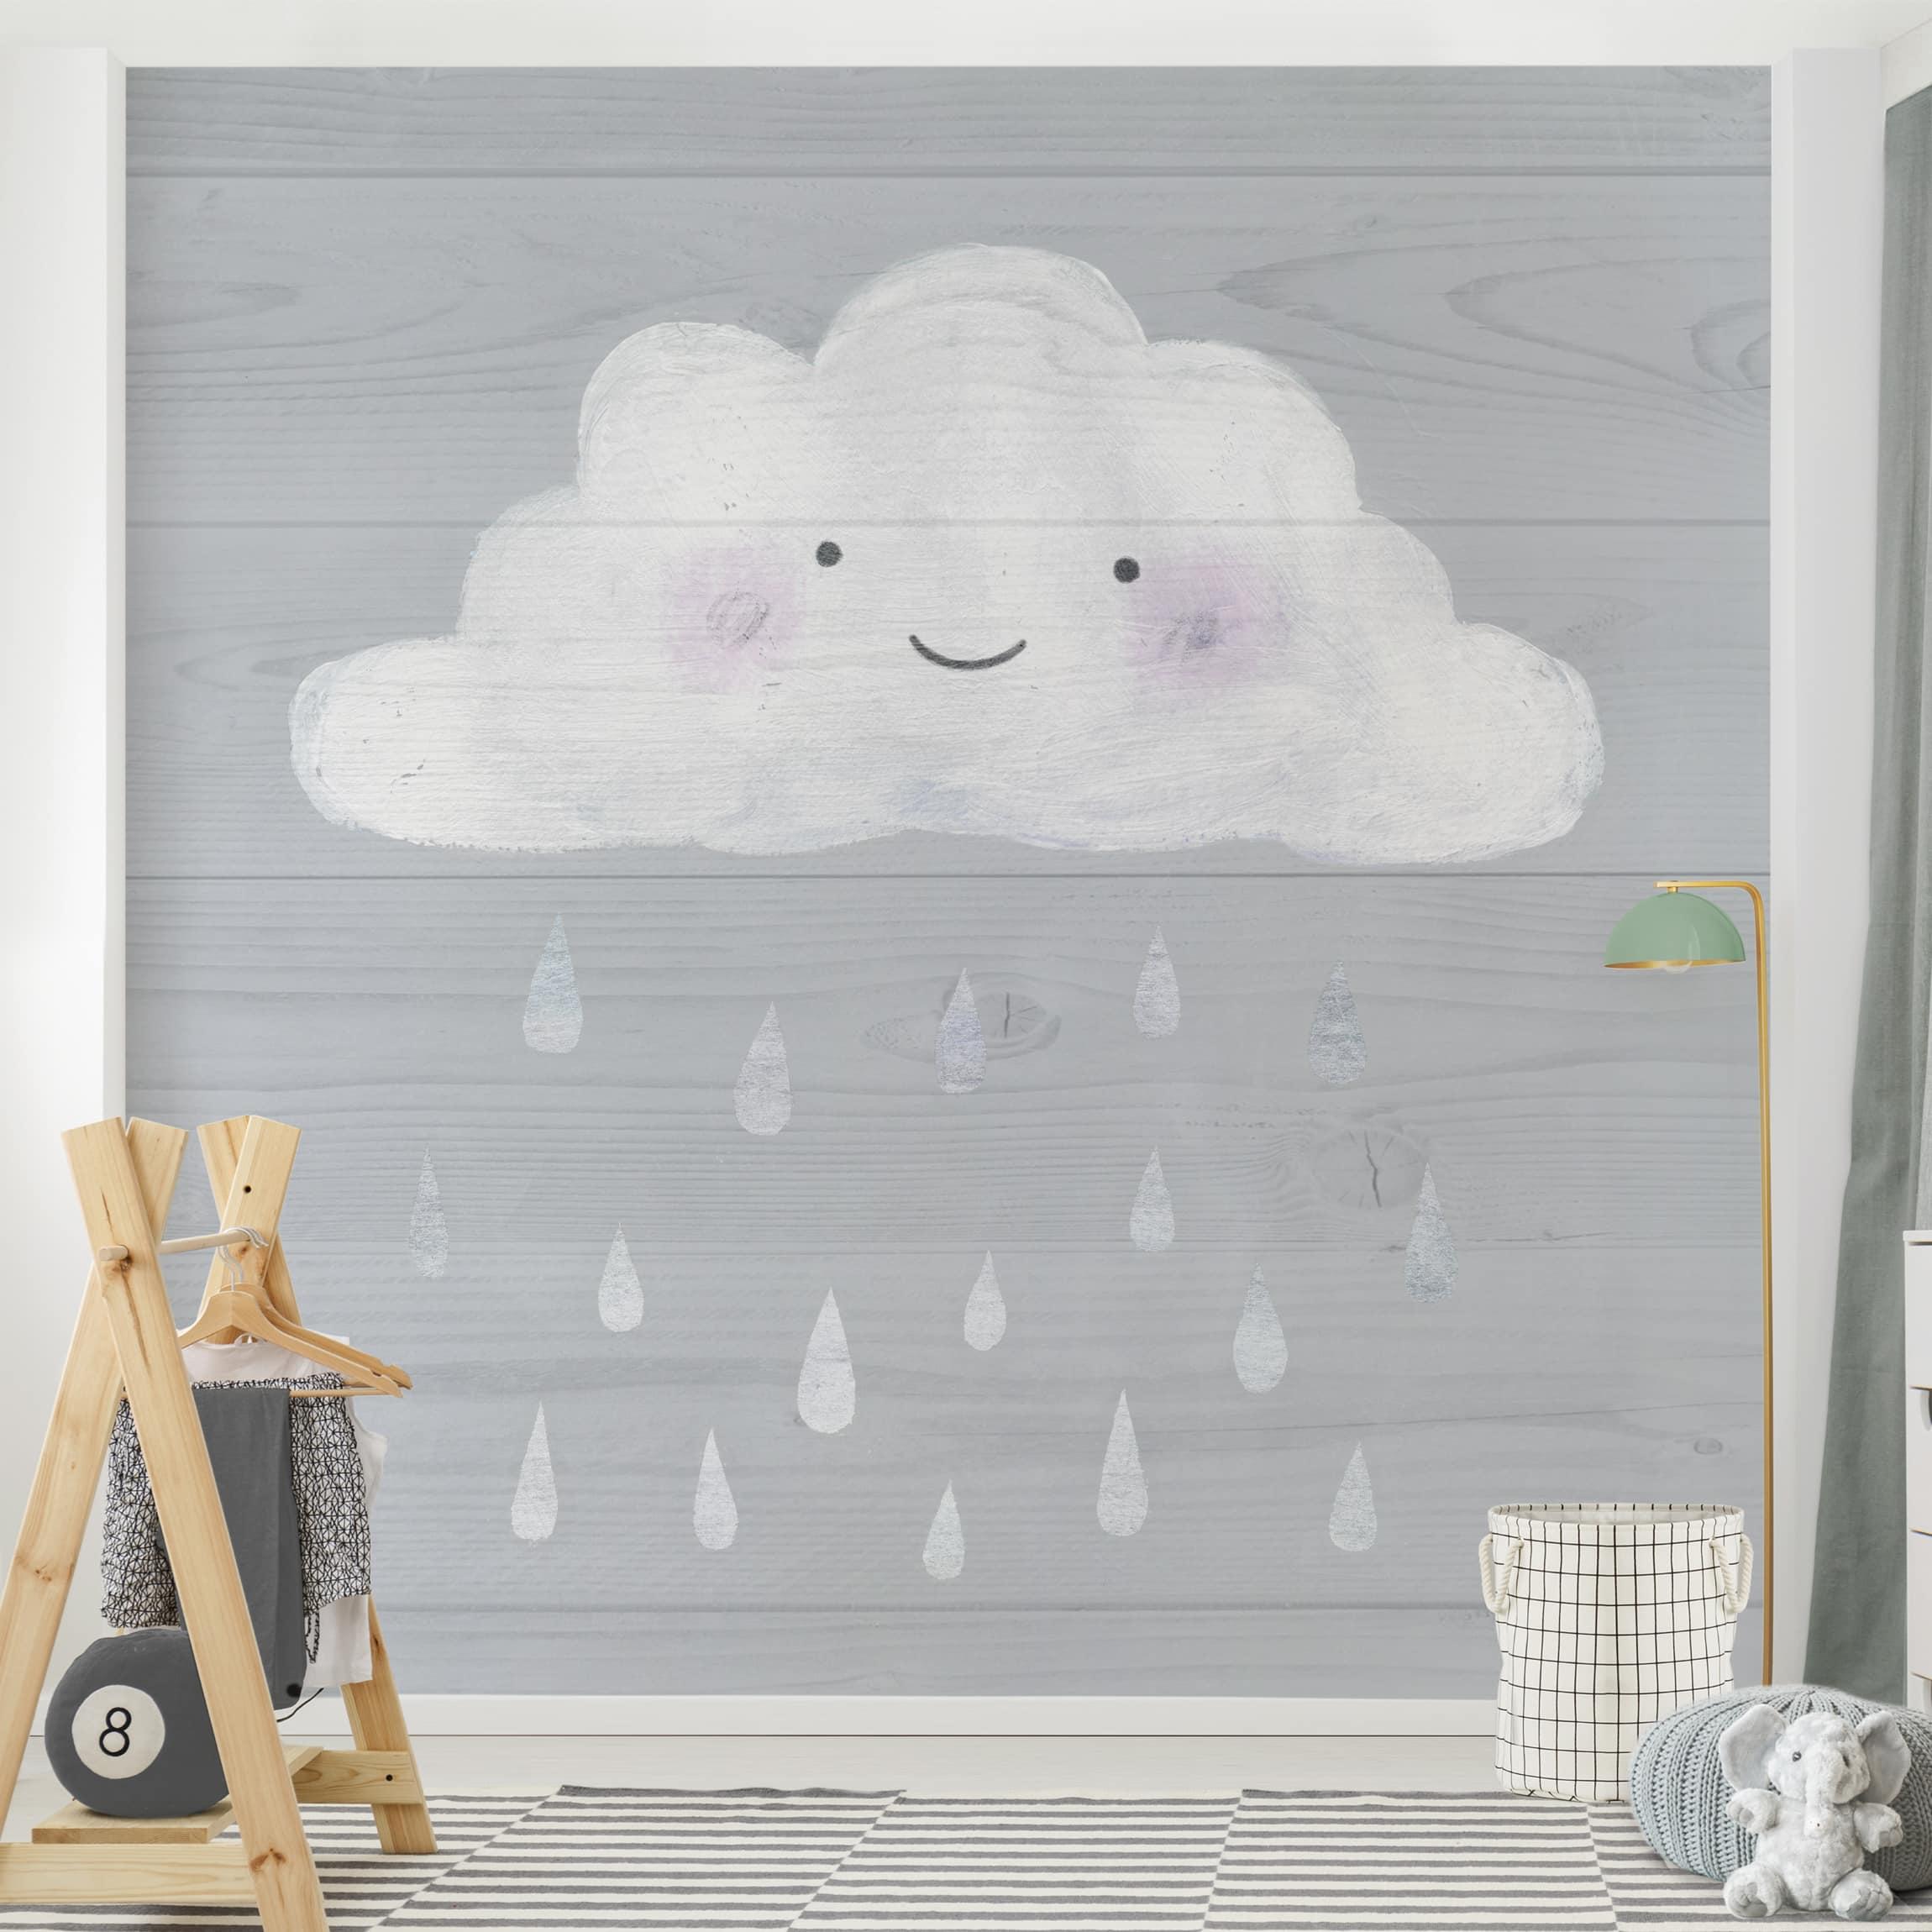 Selbstklebende Tapete Kinderzimmer - Wolke mit silbernen Regentropfen -  Fototapete Quadrat